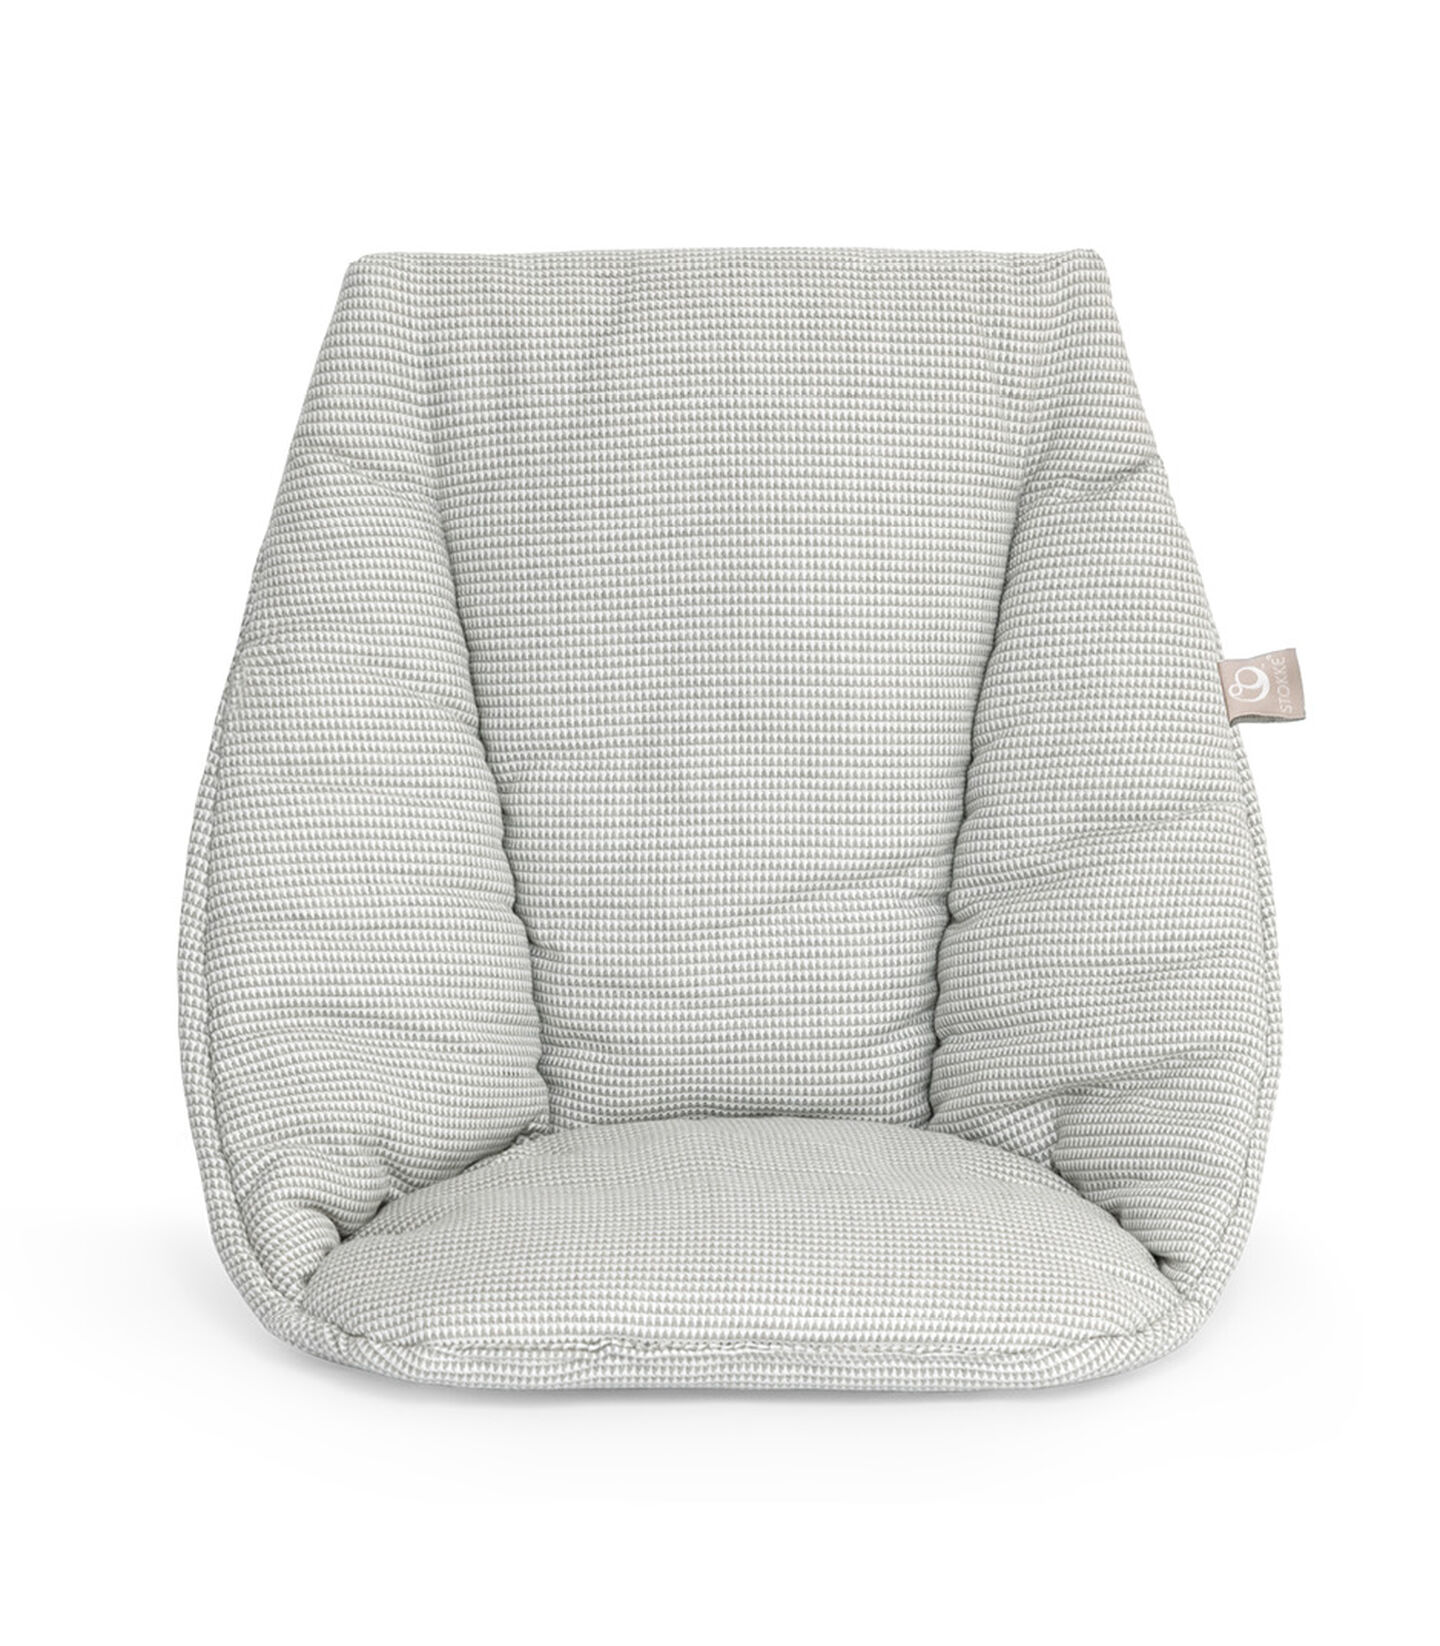 Poduszka Tripp Trapp® Baby Nordic Grey, Nordic Grey, mainview view 1